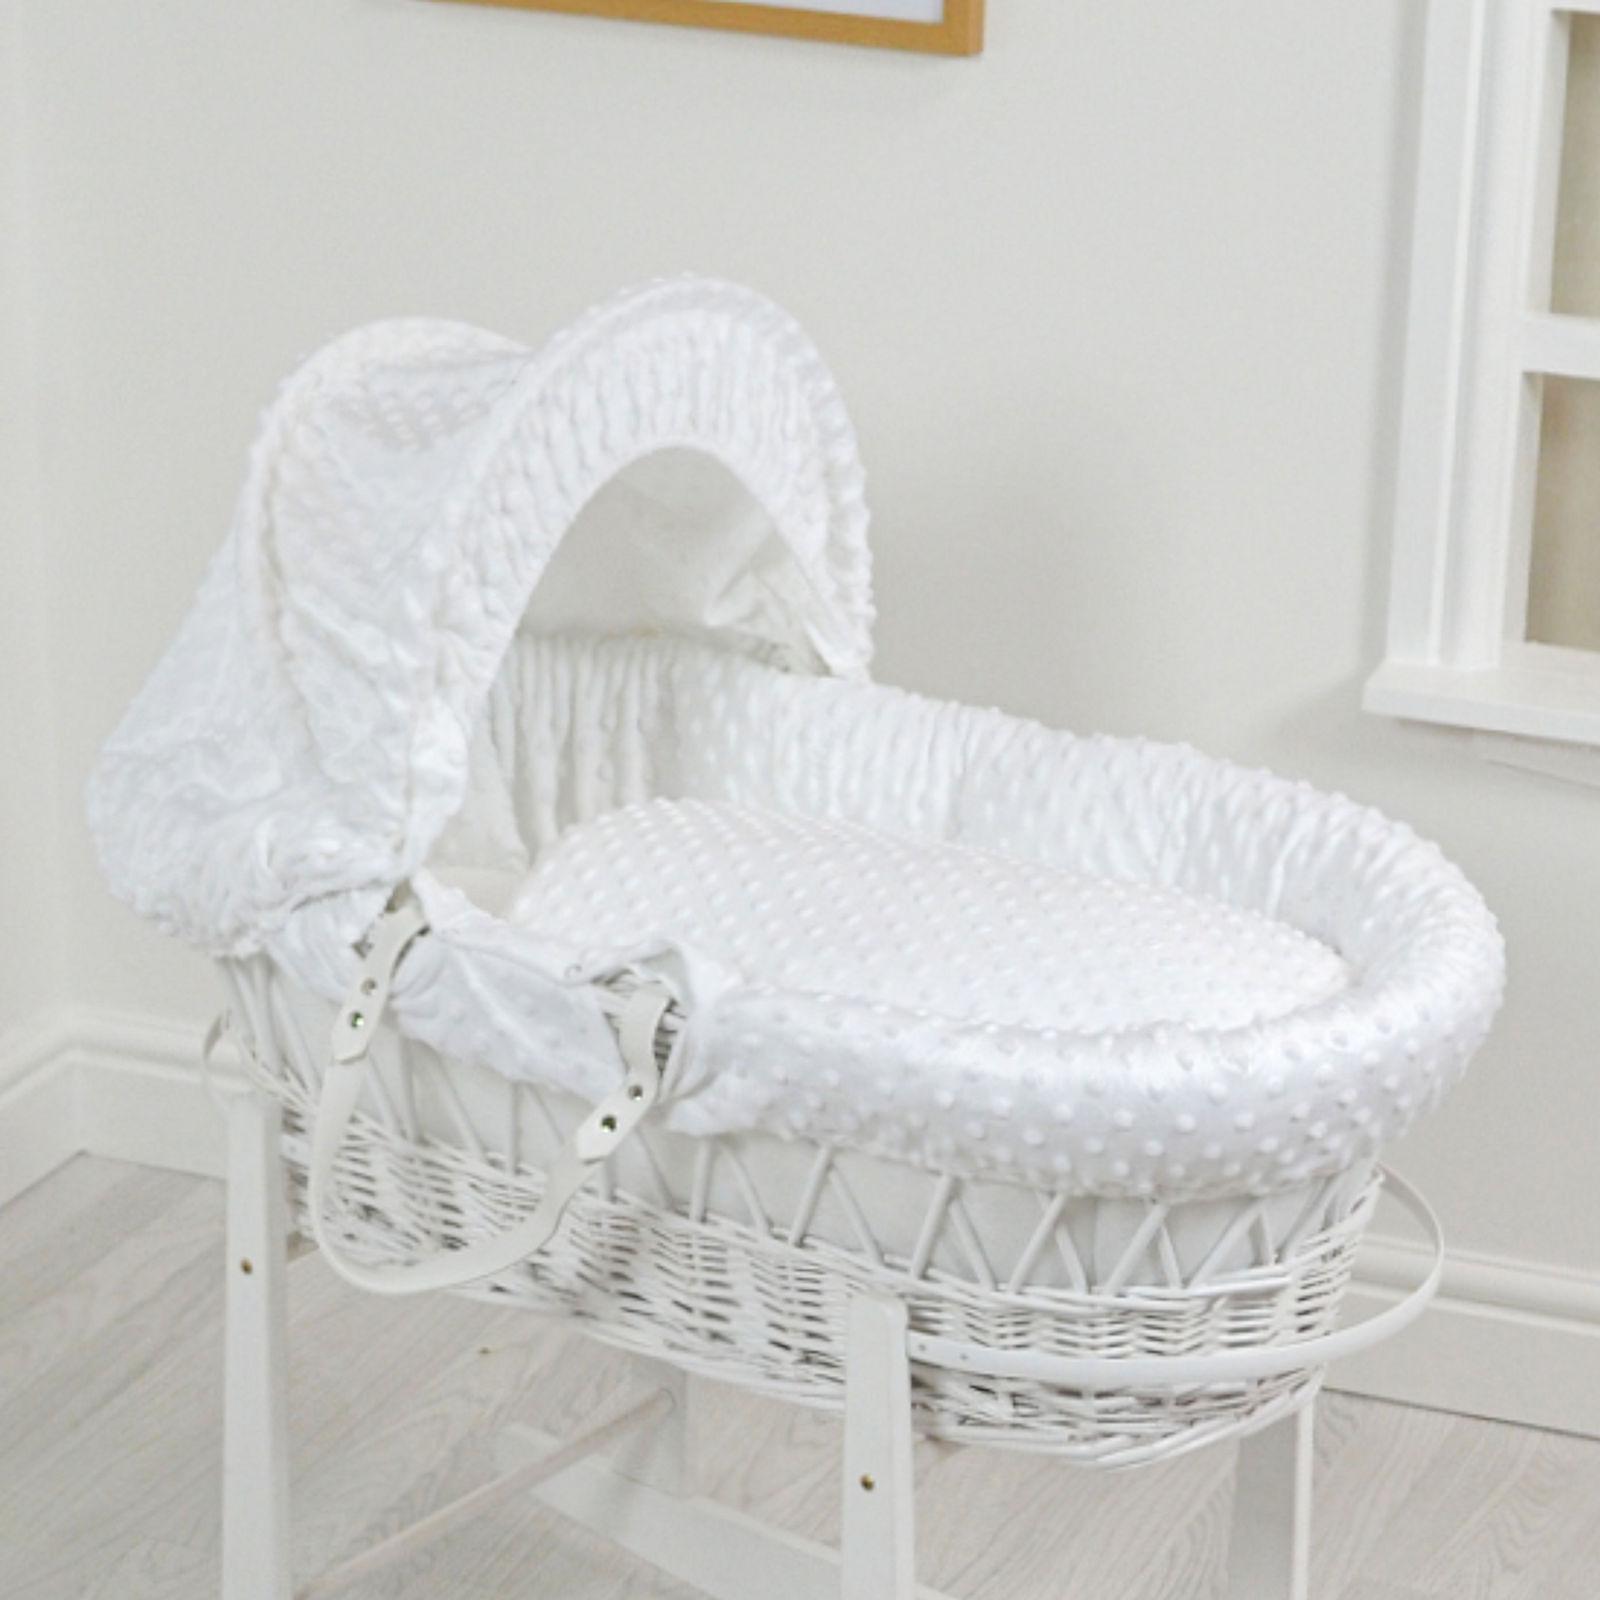 4baby Luxury Padded White Wicker Baby Moses Basket White